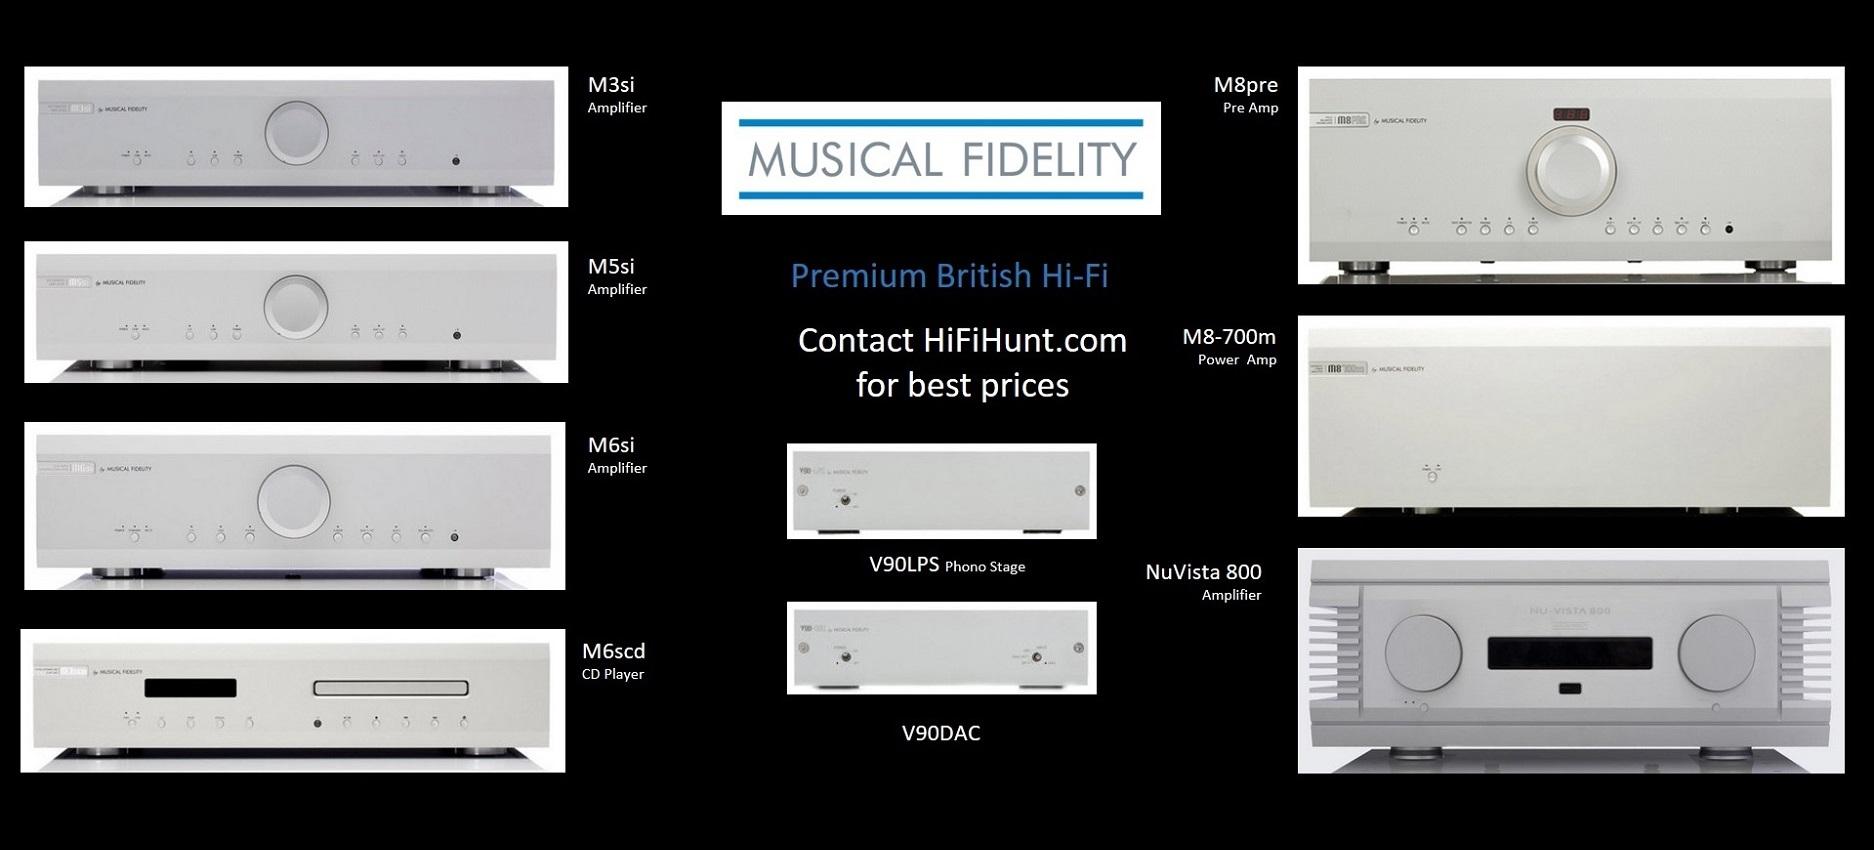 MusicalFidalityMaster